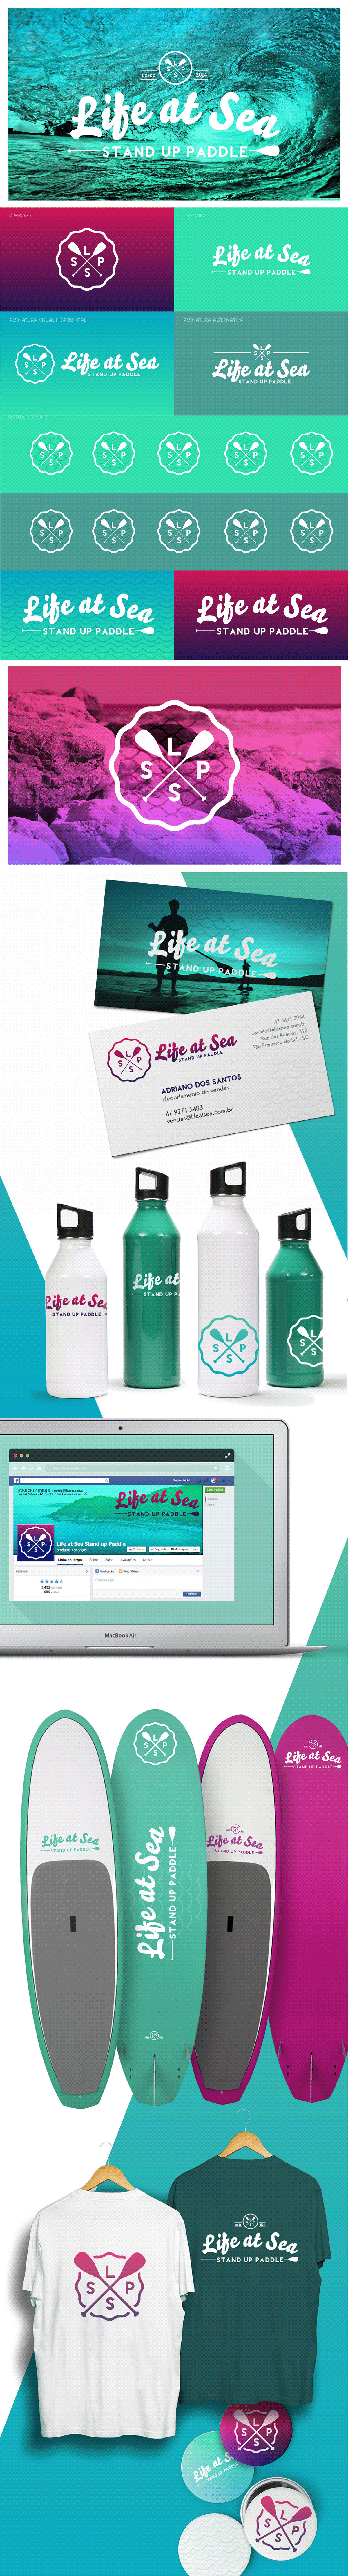 Logo Design sup surfwear sea Ocean lifestyle sport water standup padlle Youthful